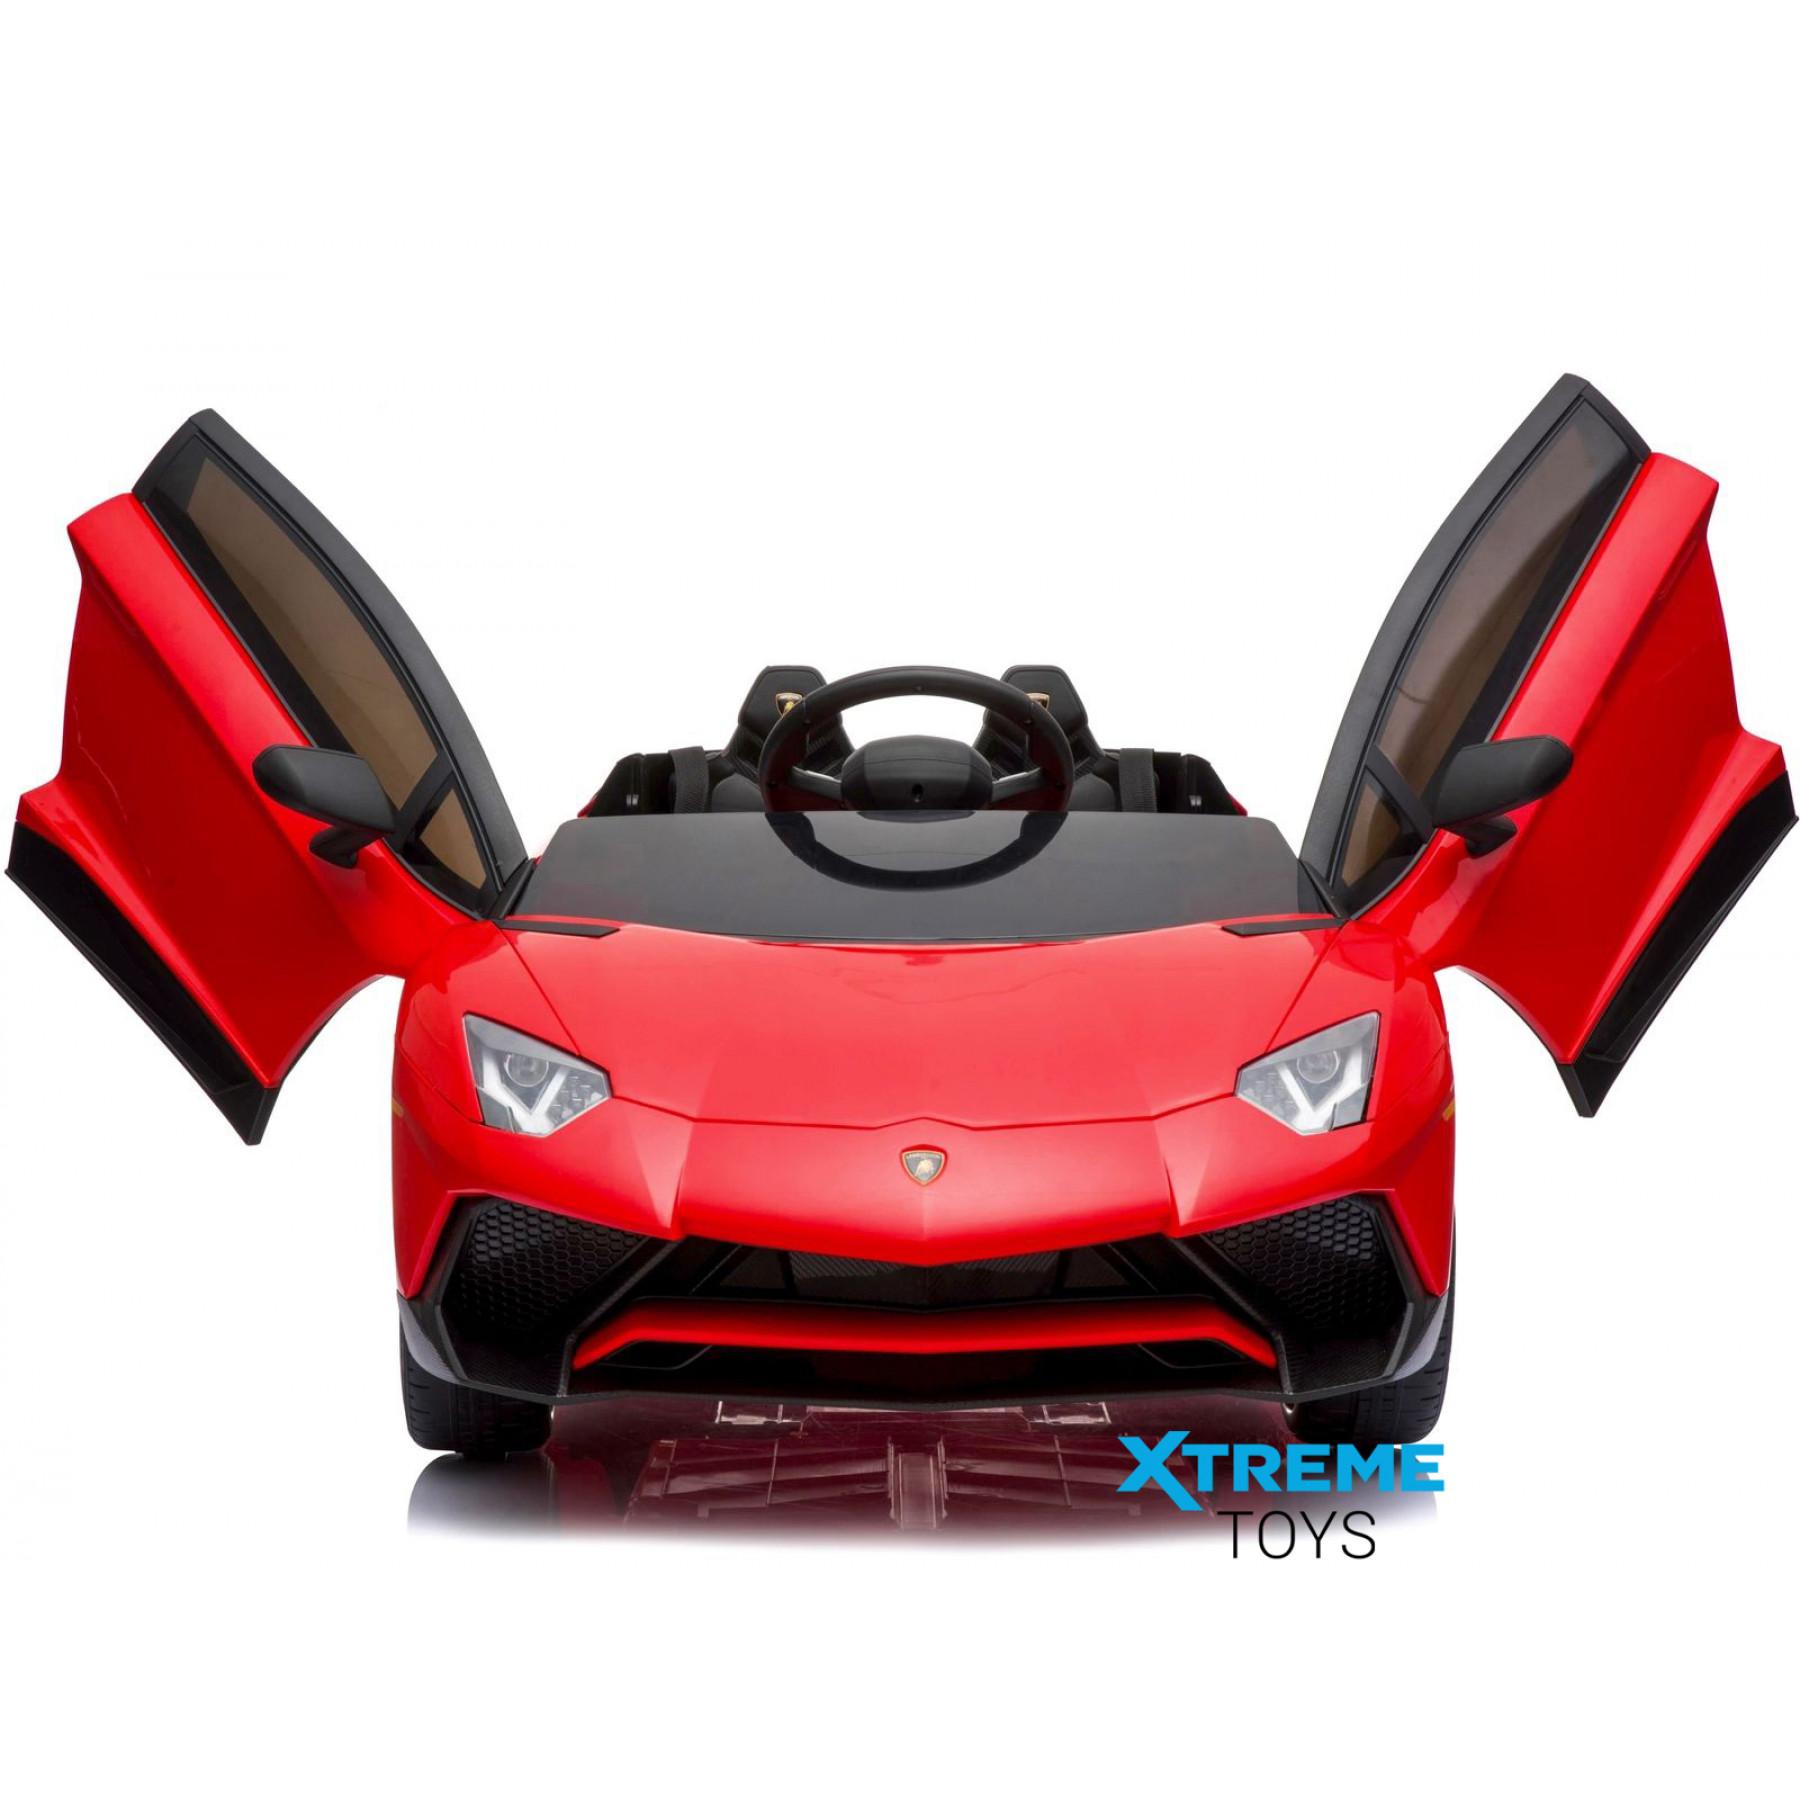 Xtreme 12v Official Licensed Lamborghini Aventador SV Ride on Car Red